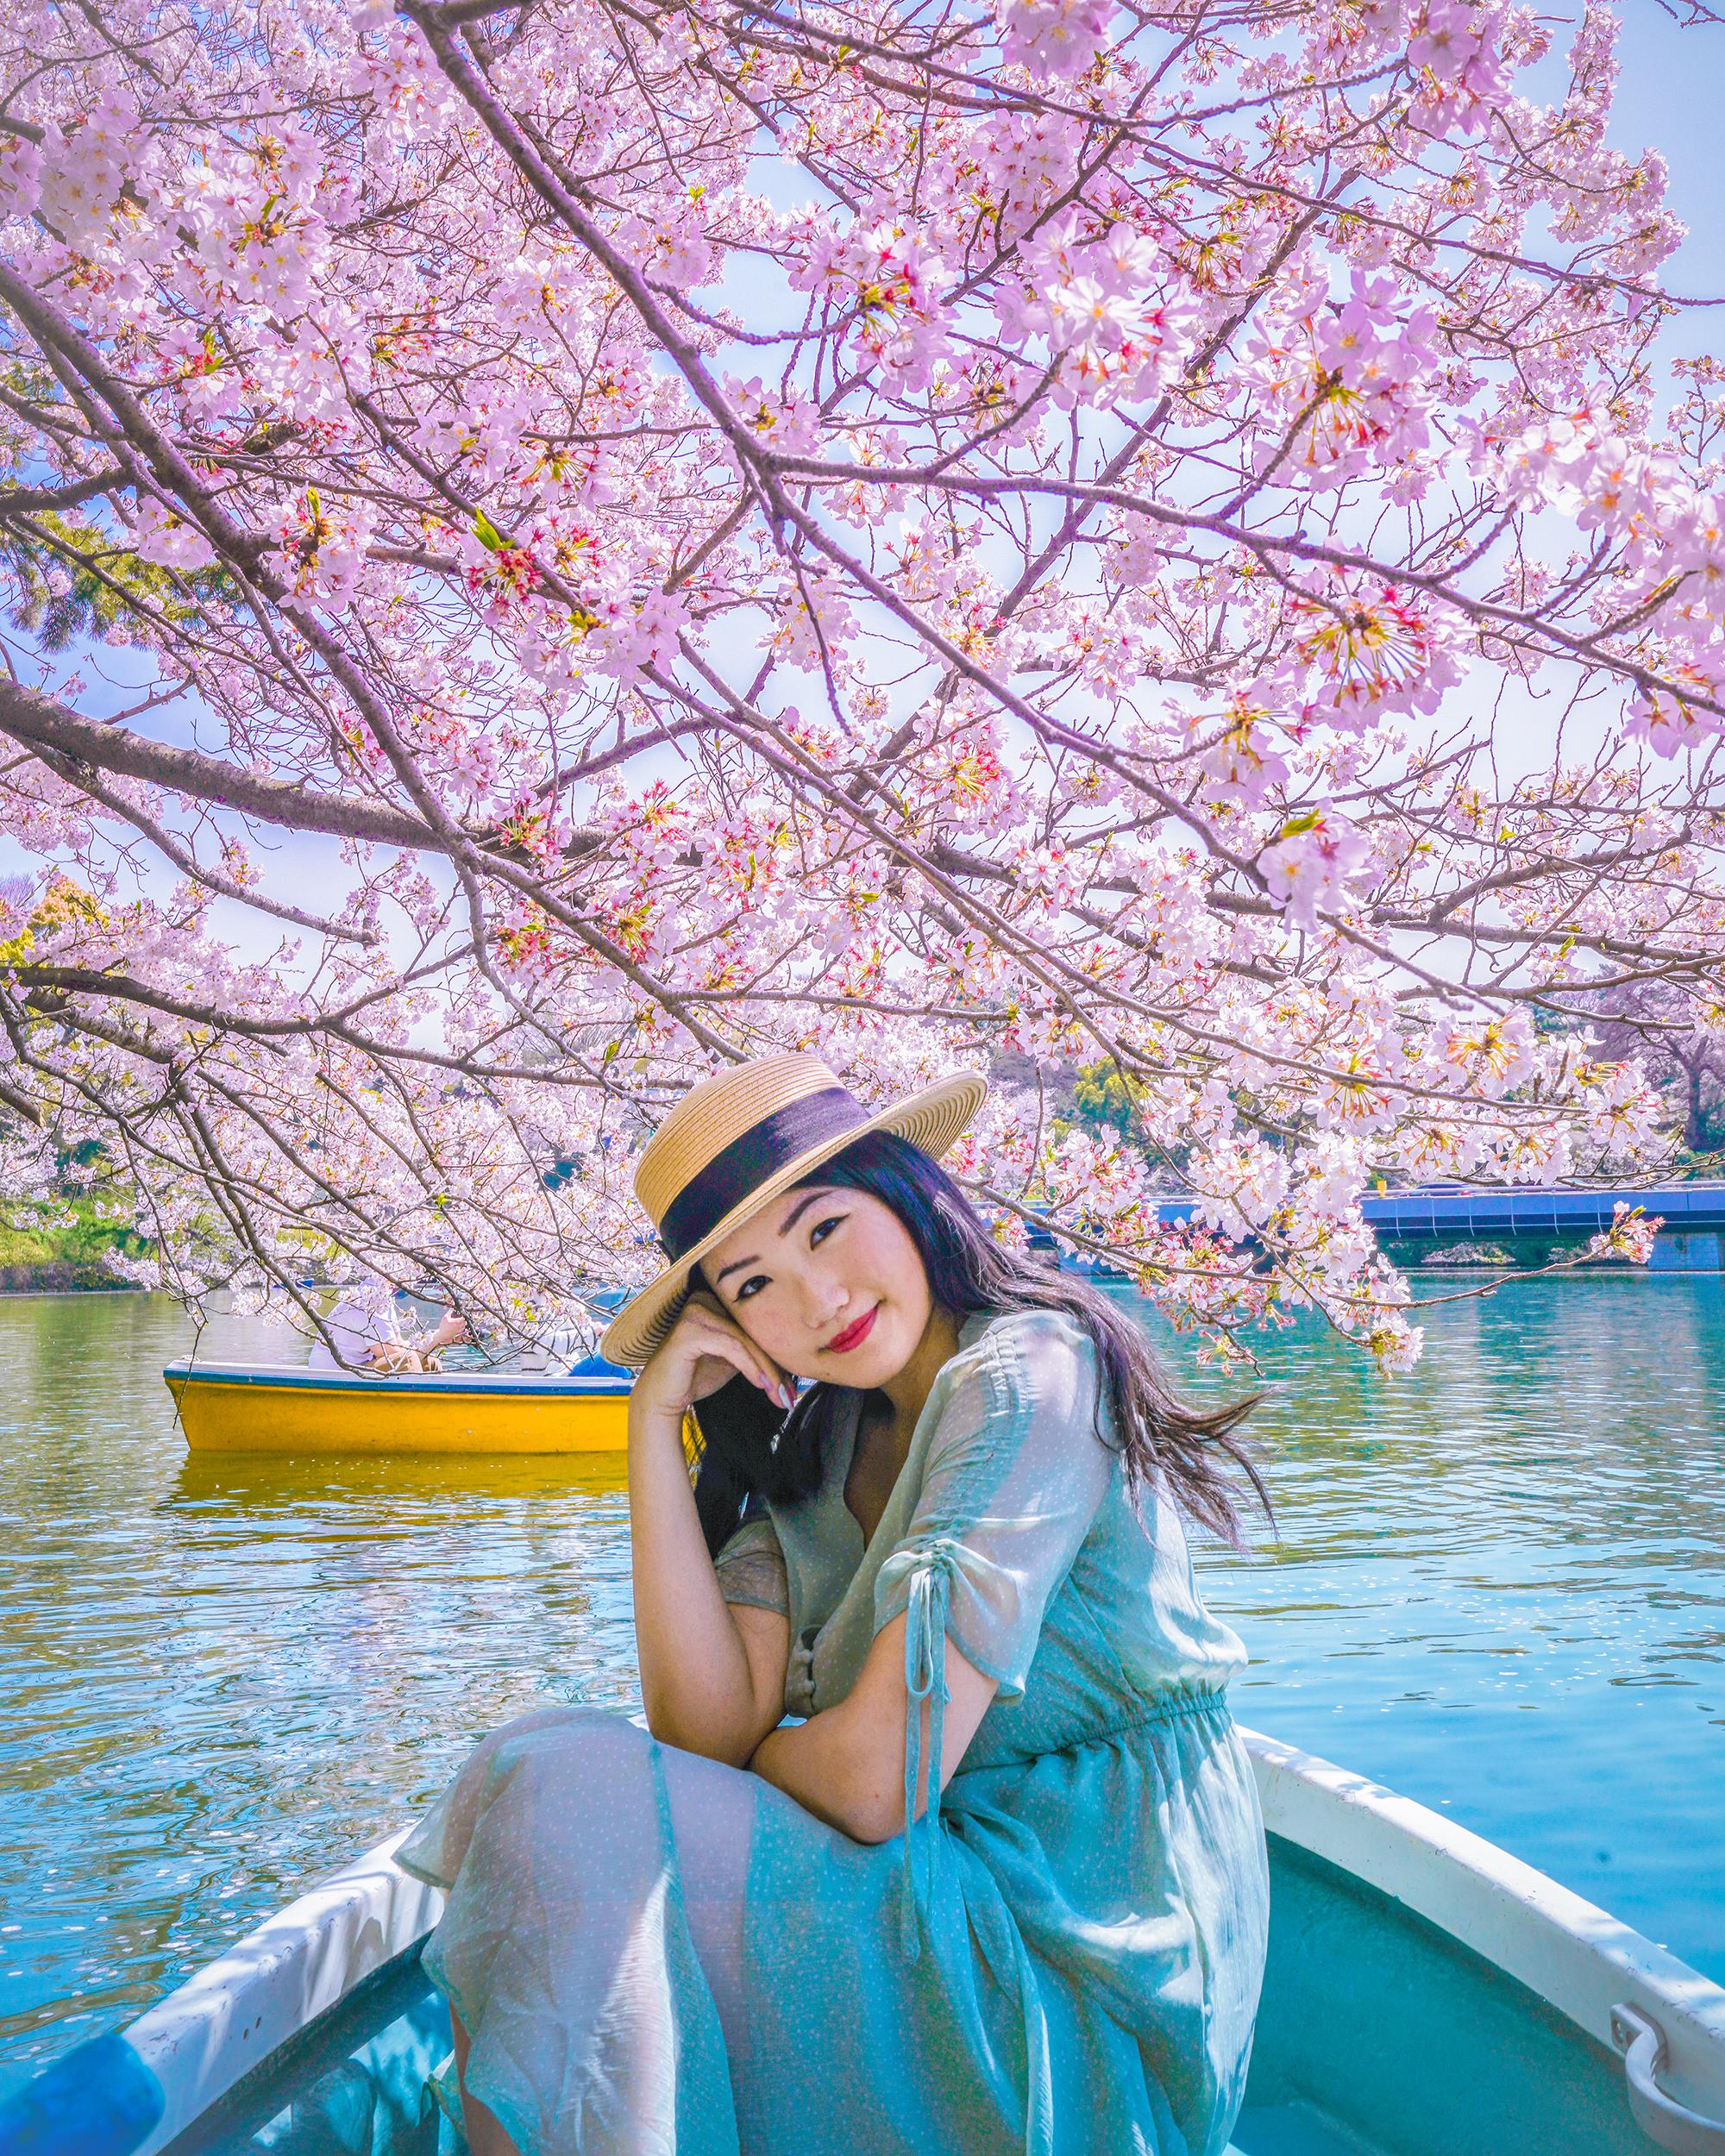 Enjoying hanami from a boat at Chidorigafuchi Park.